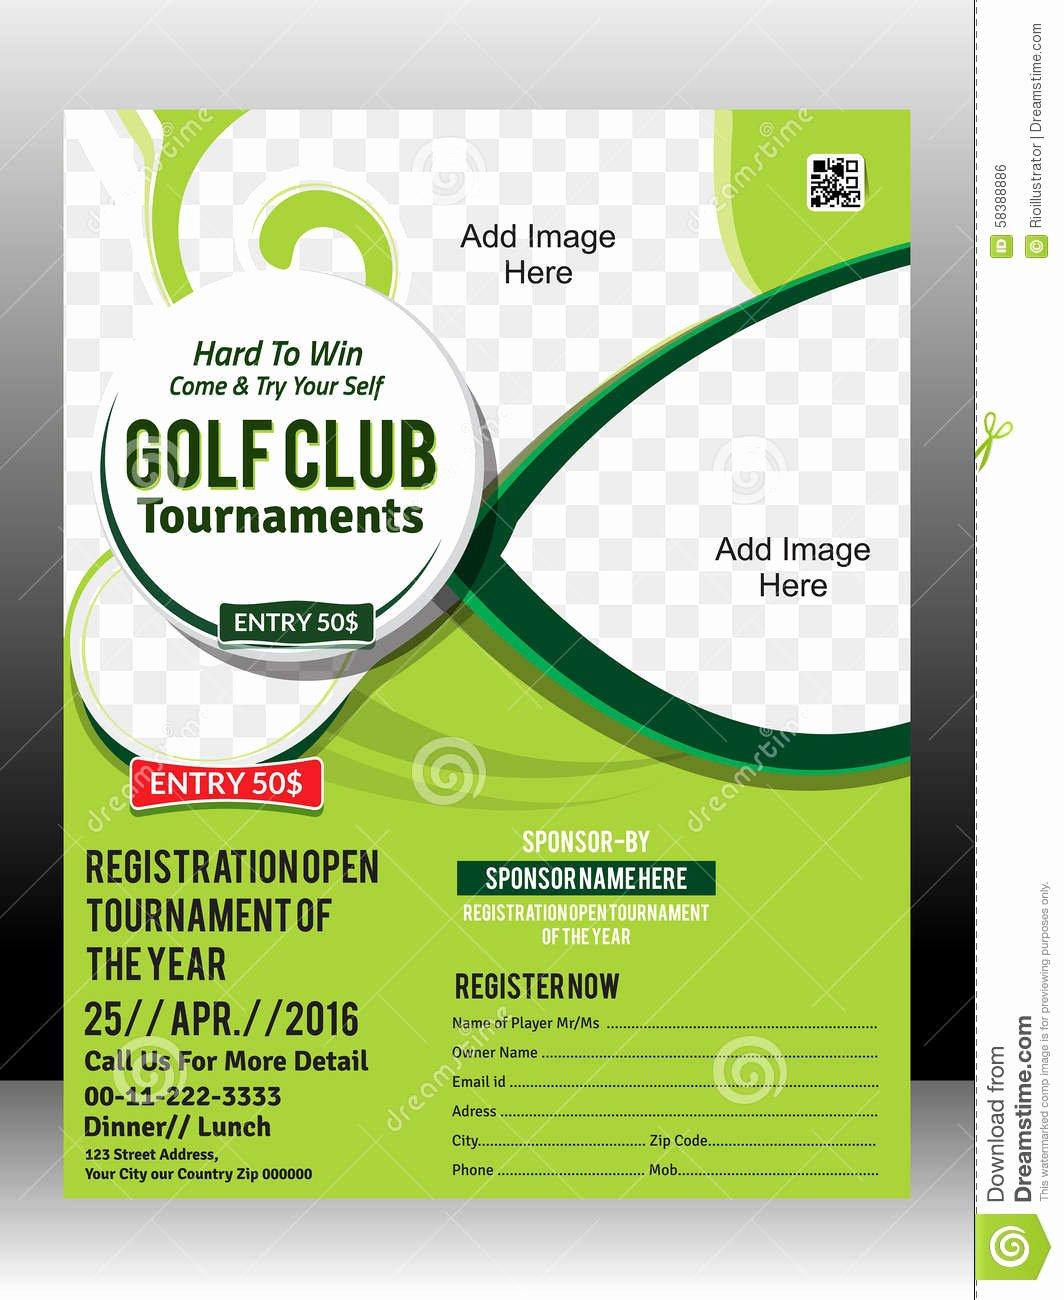 Free Golf tournament Flyer Template Beautiful Free Golf tournament Flyer Template